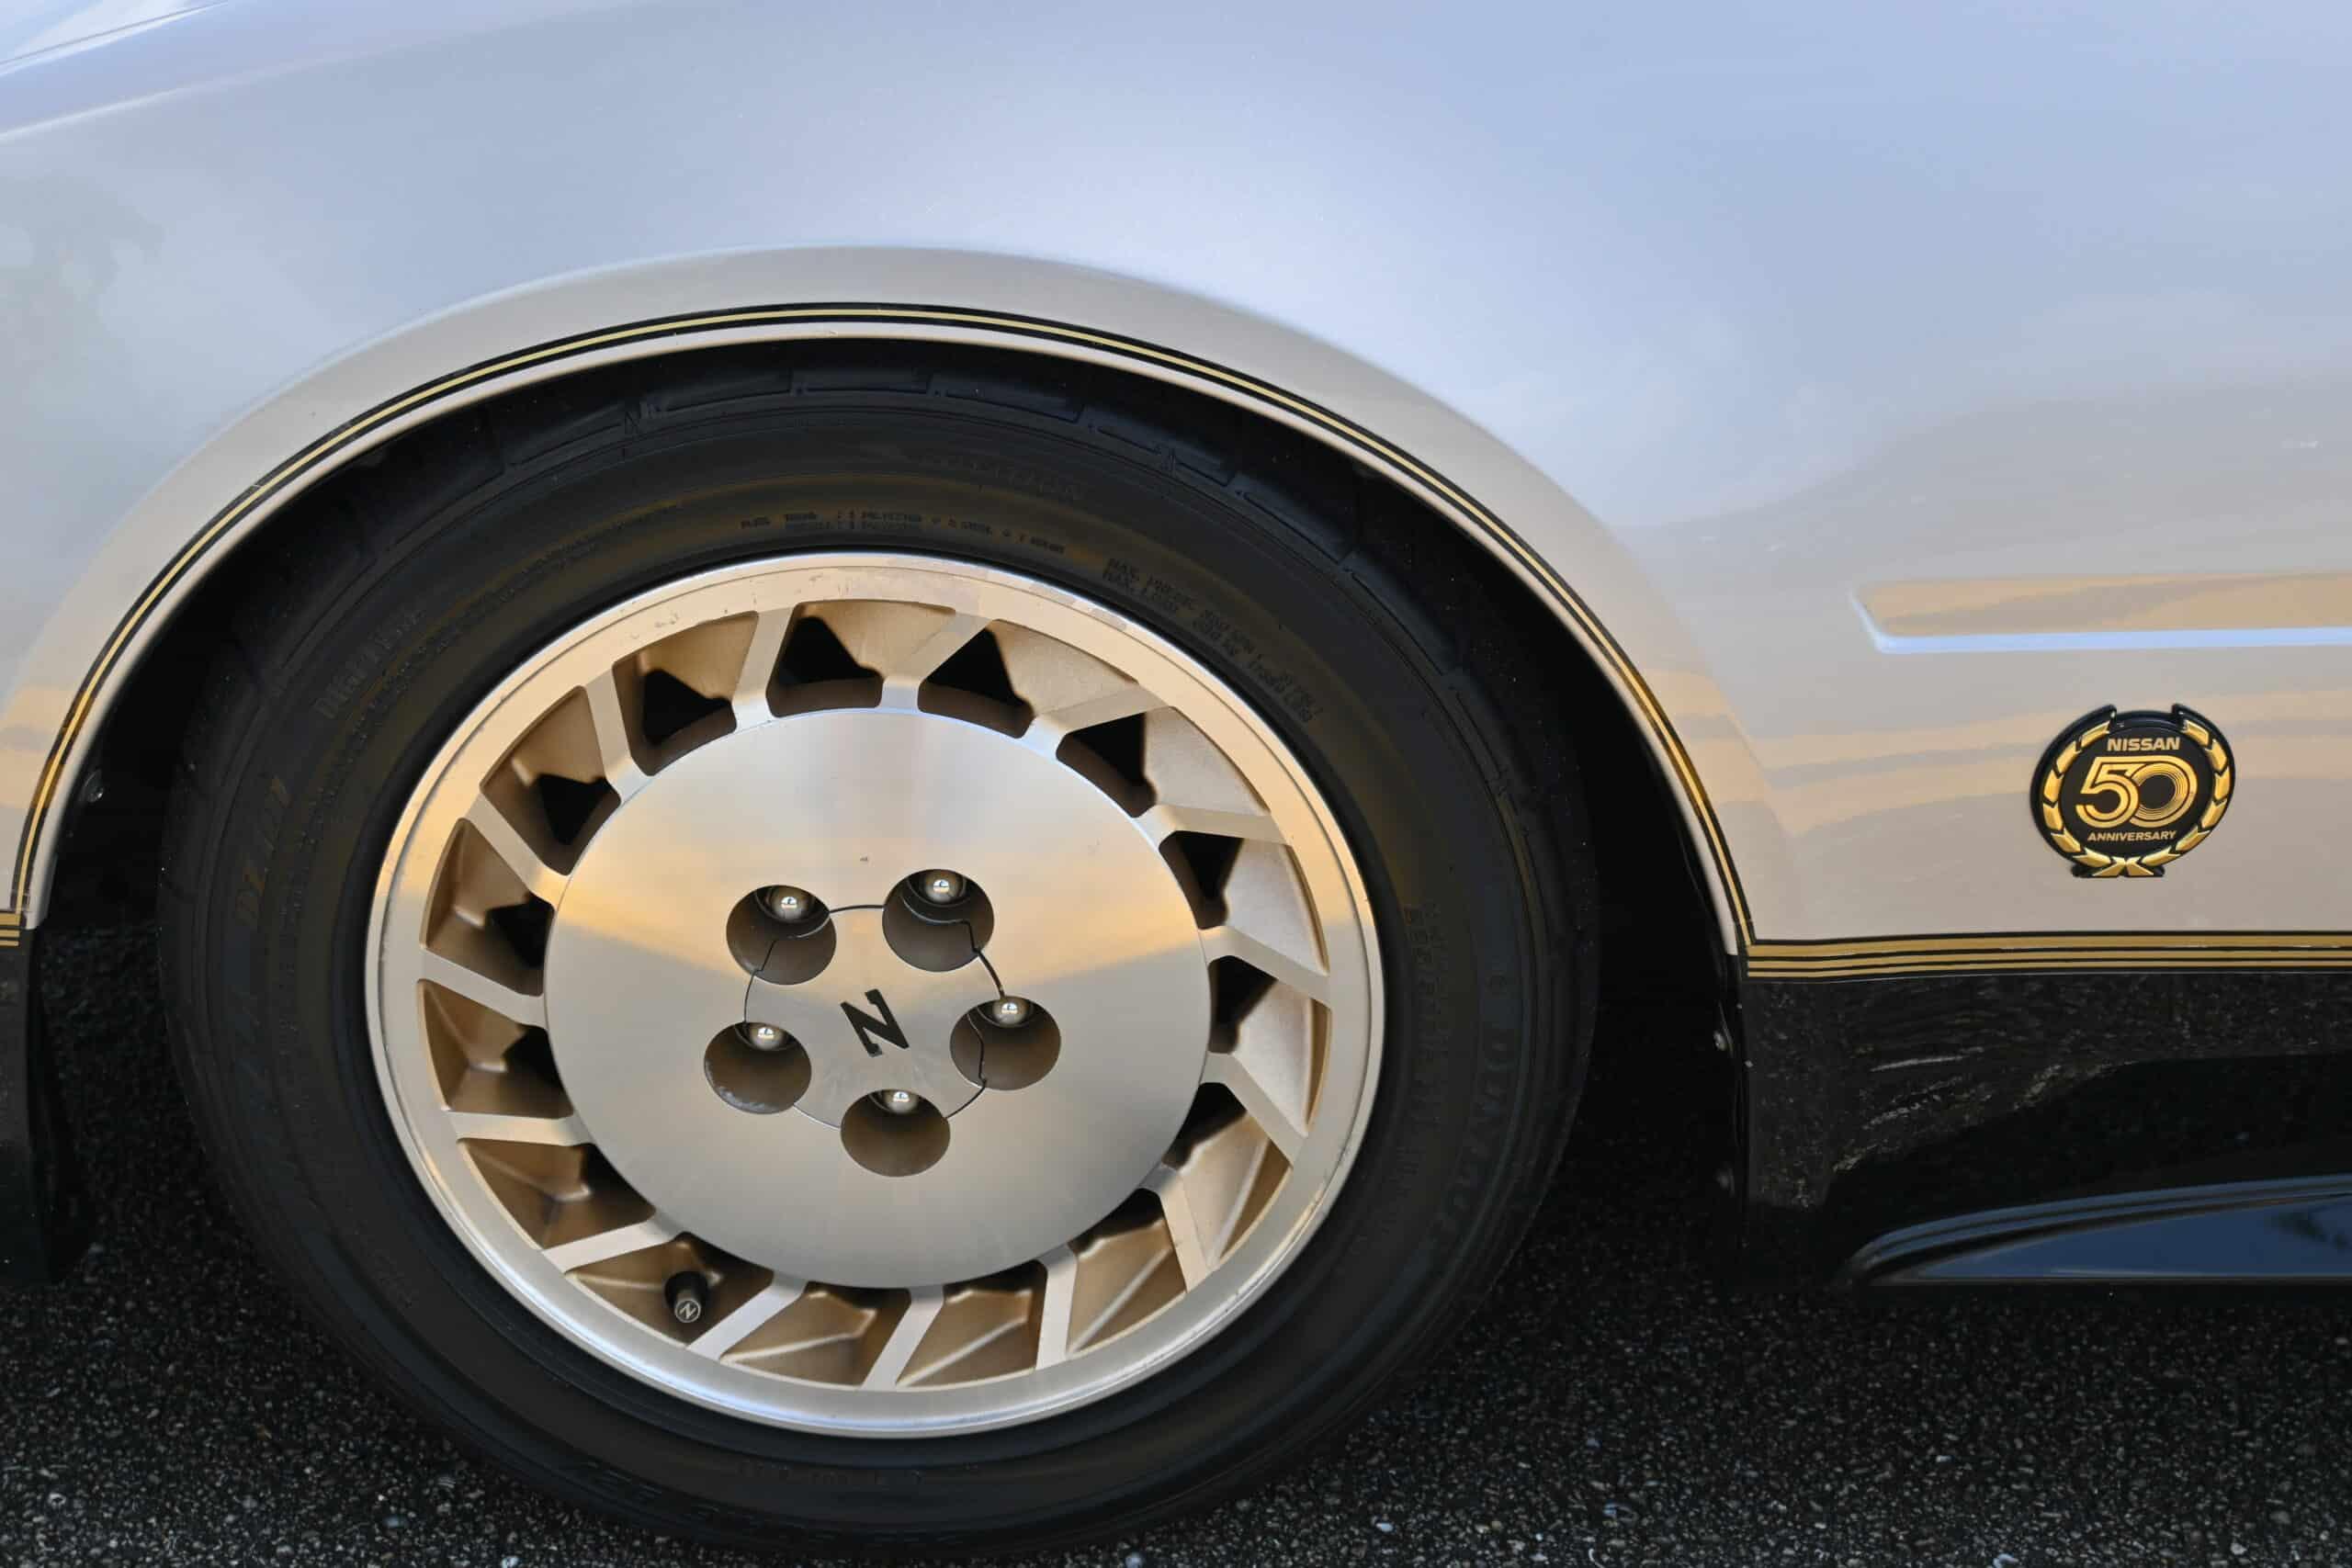 1984 Nissan 300ZX Turbo 50th Anniversary